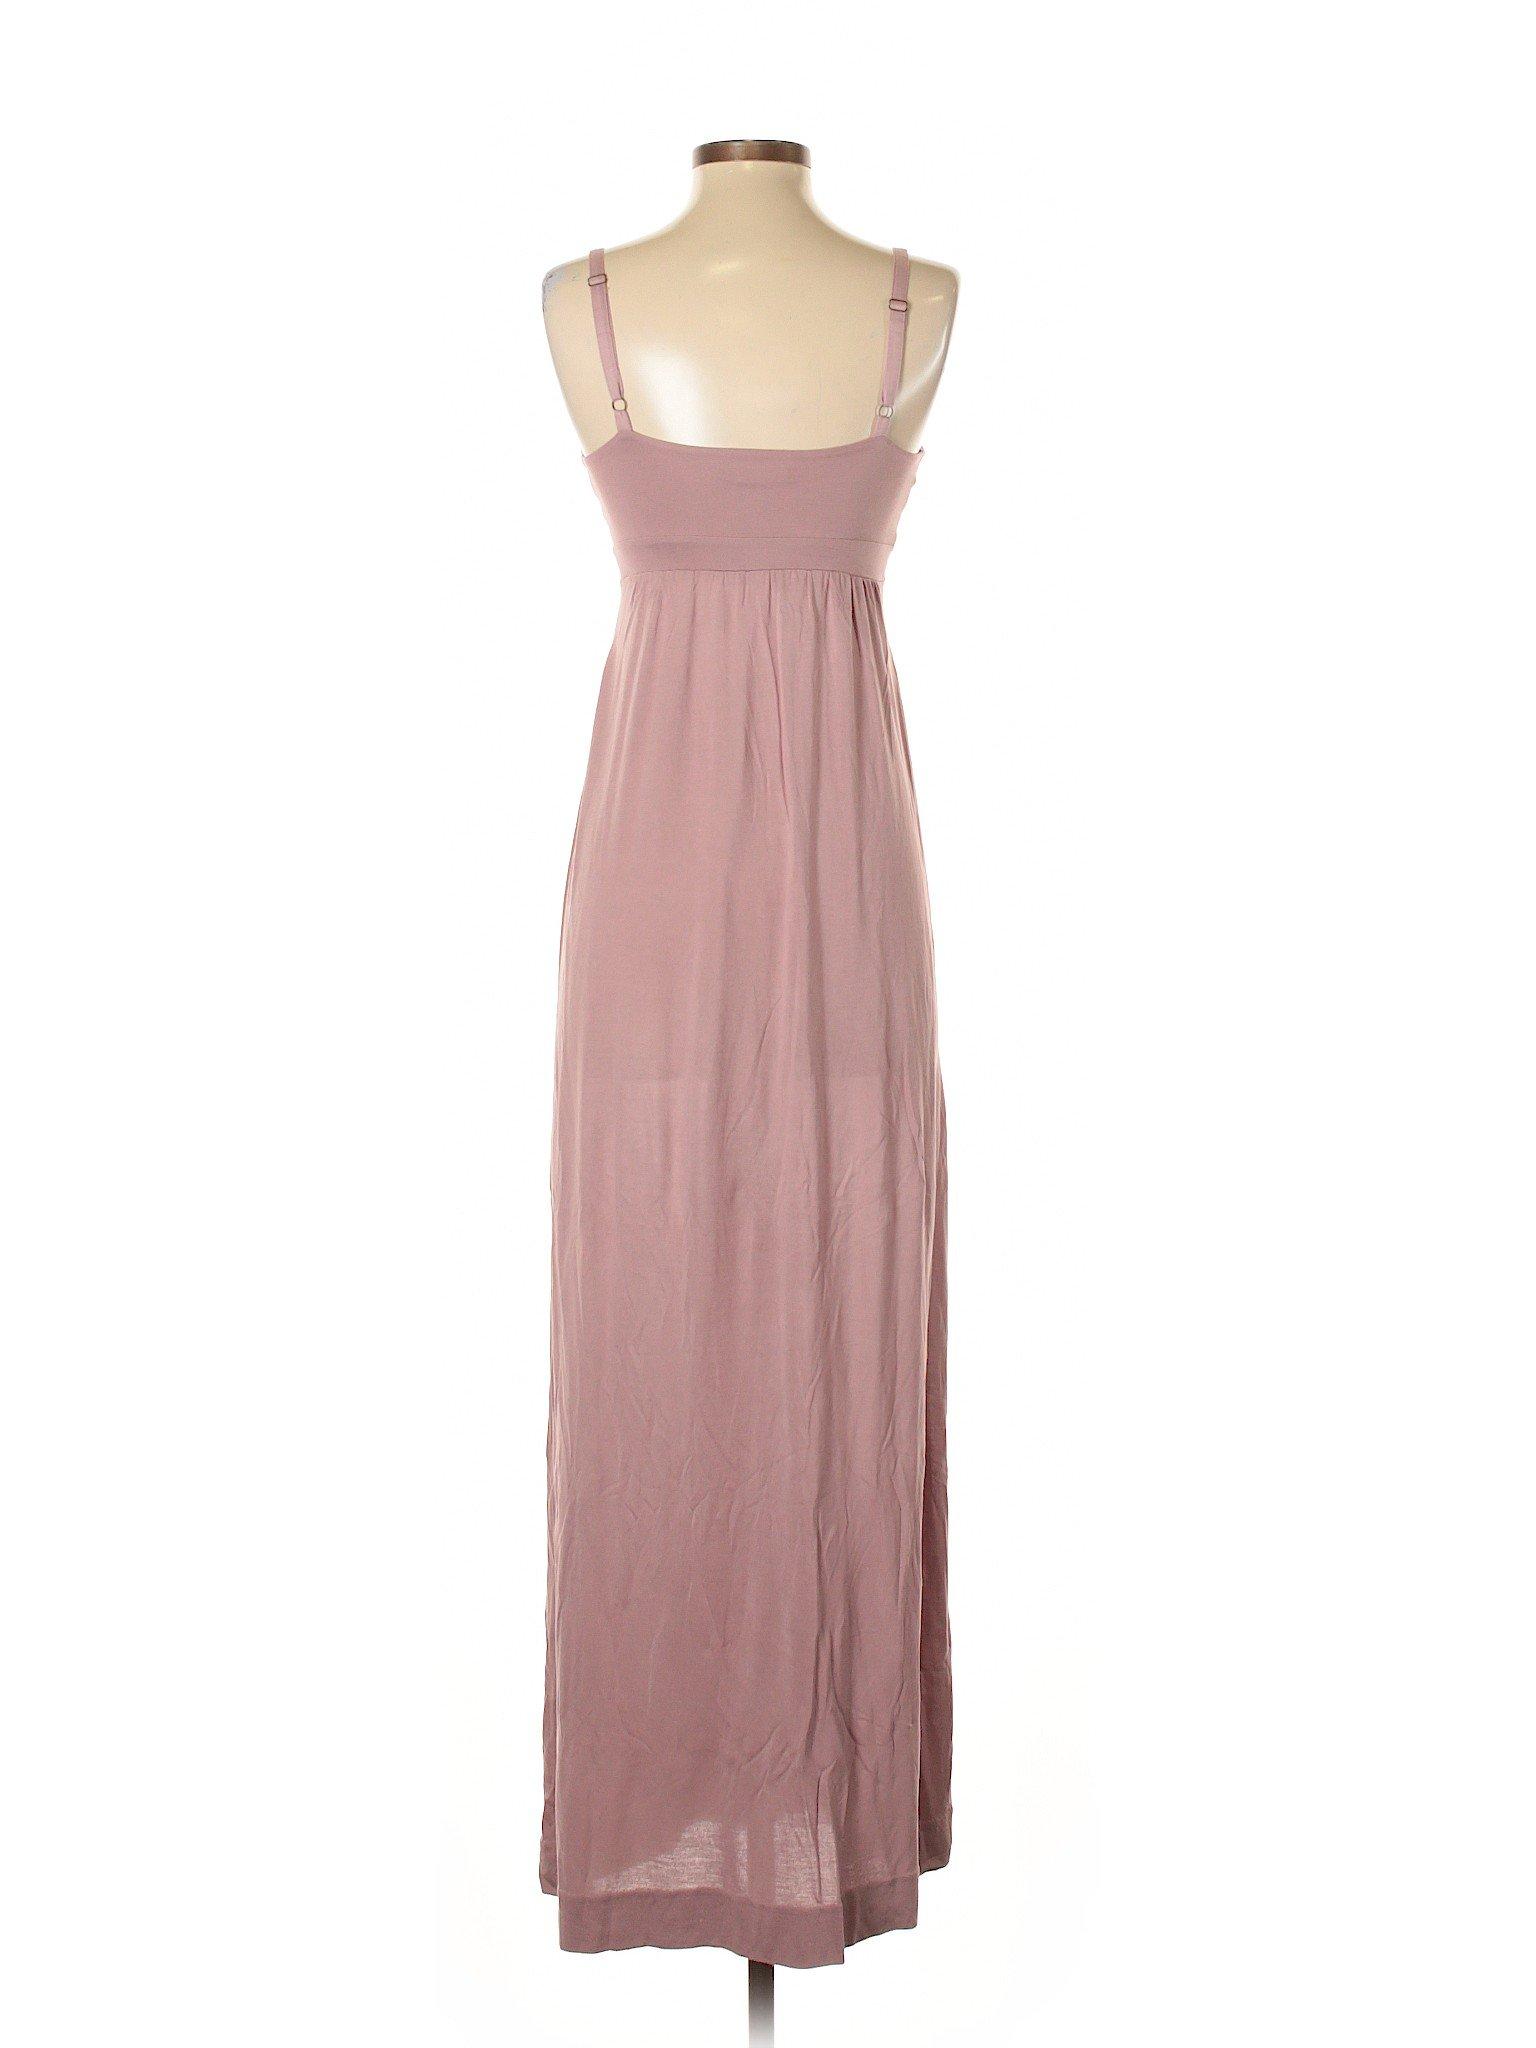 amp; York New winter Dress Casual Company Boutique qtASwZRHx